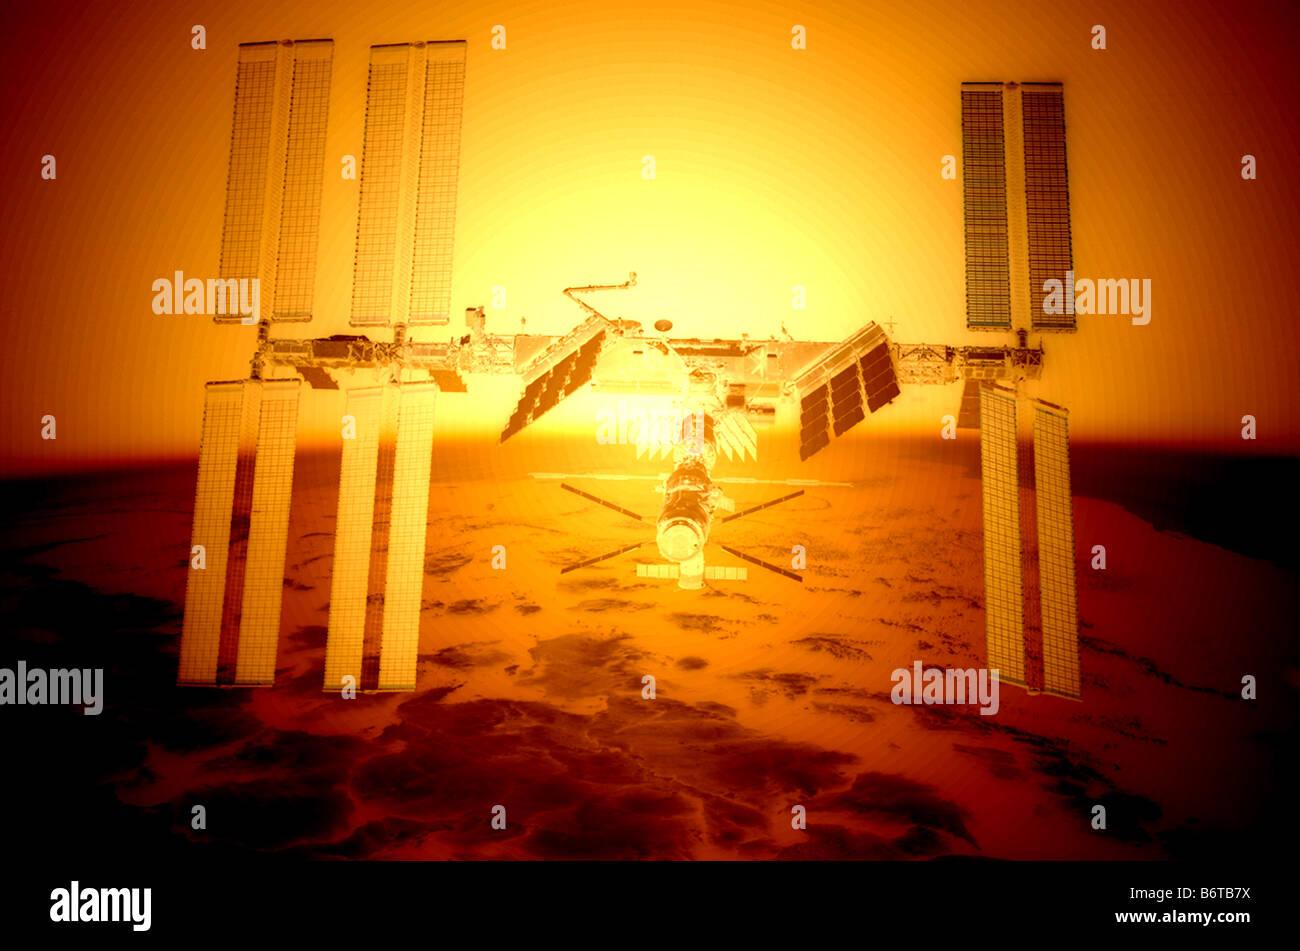 computer enhanced NASA image of International Space Station (ISS) flying above earth sunrise - Stock Image